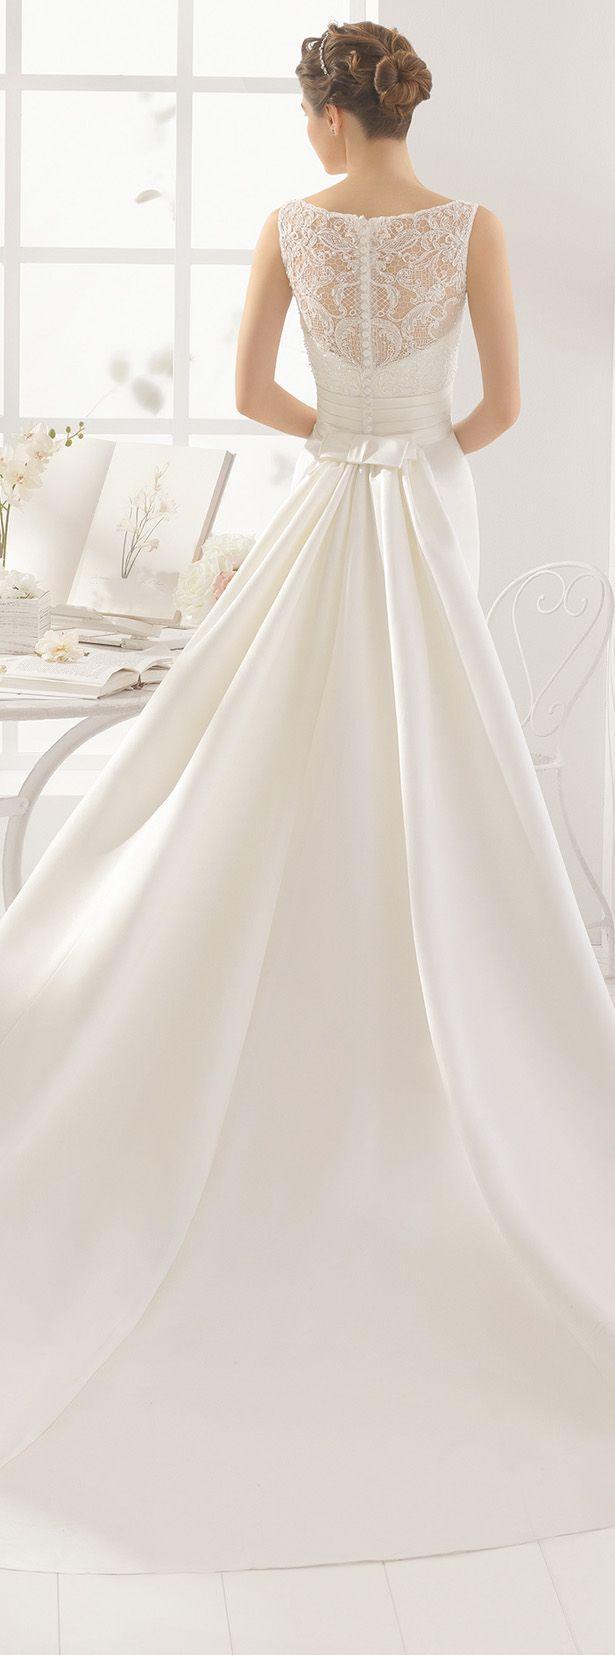 Mariage - Aire Barcelona 2016 Wedding Dress